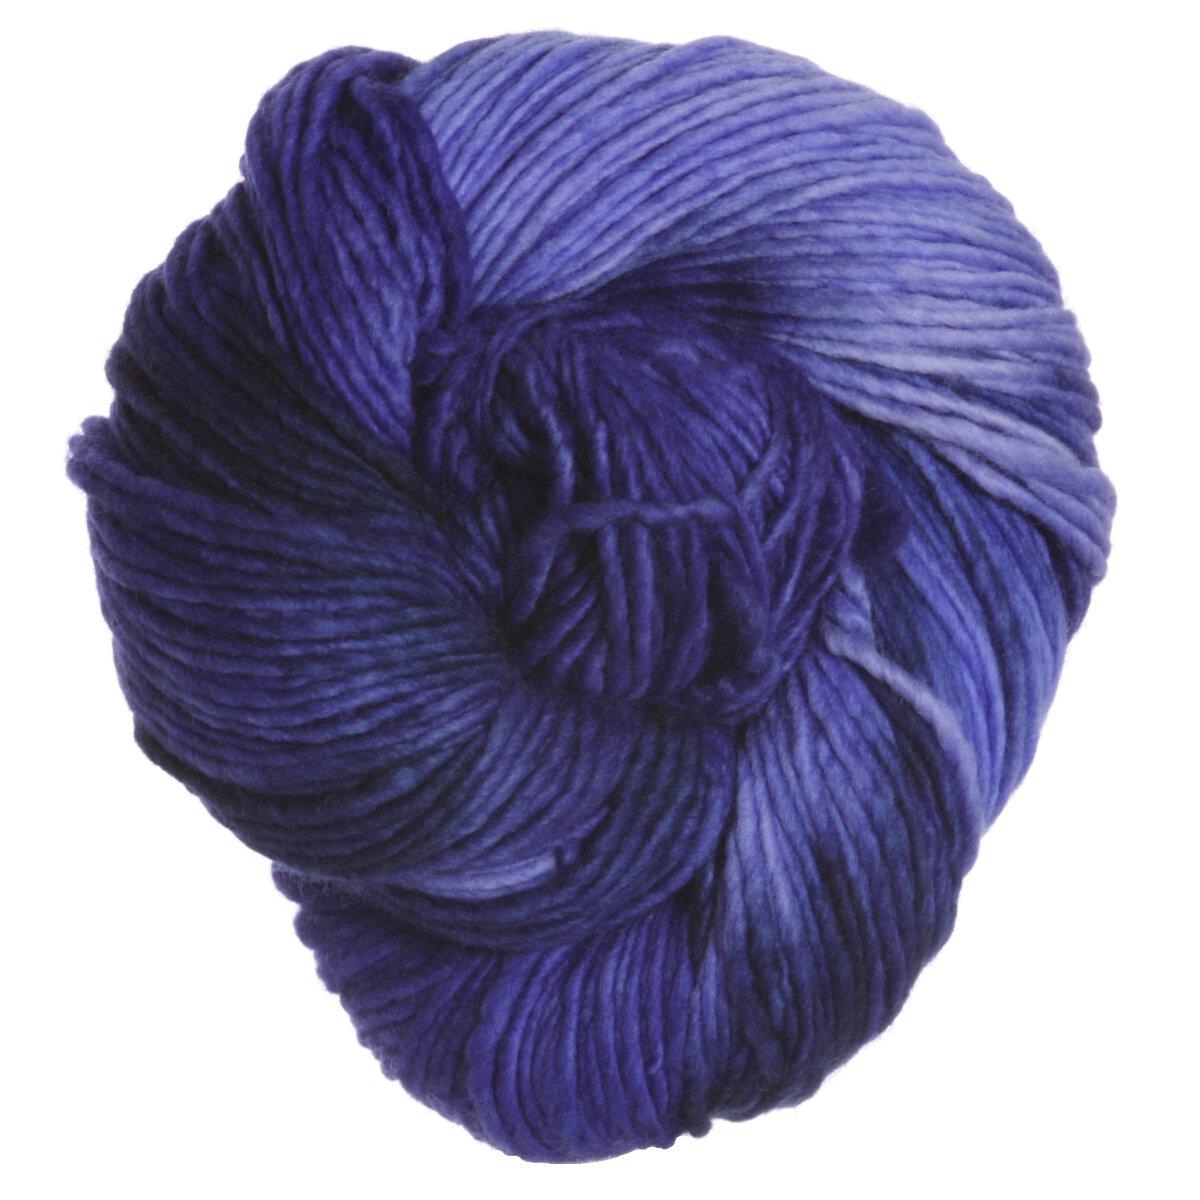 Worsted Yarn : Malabrigo Worsted Merino Yarn Reviews at Jimmy Beans Wool